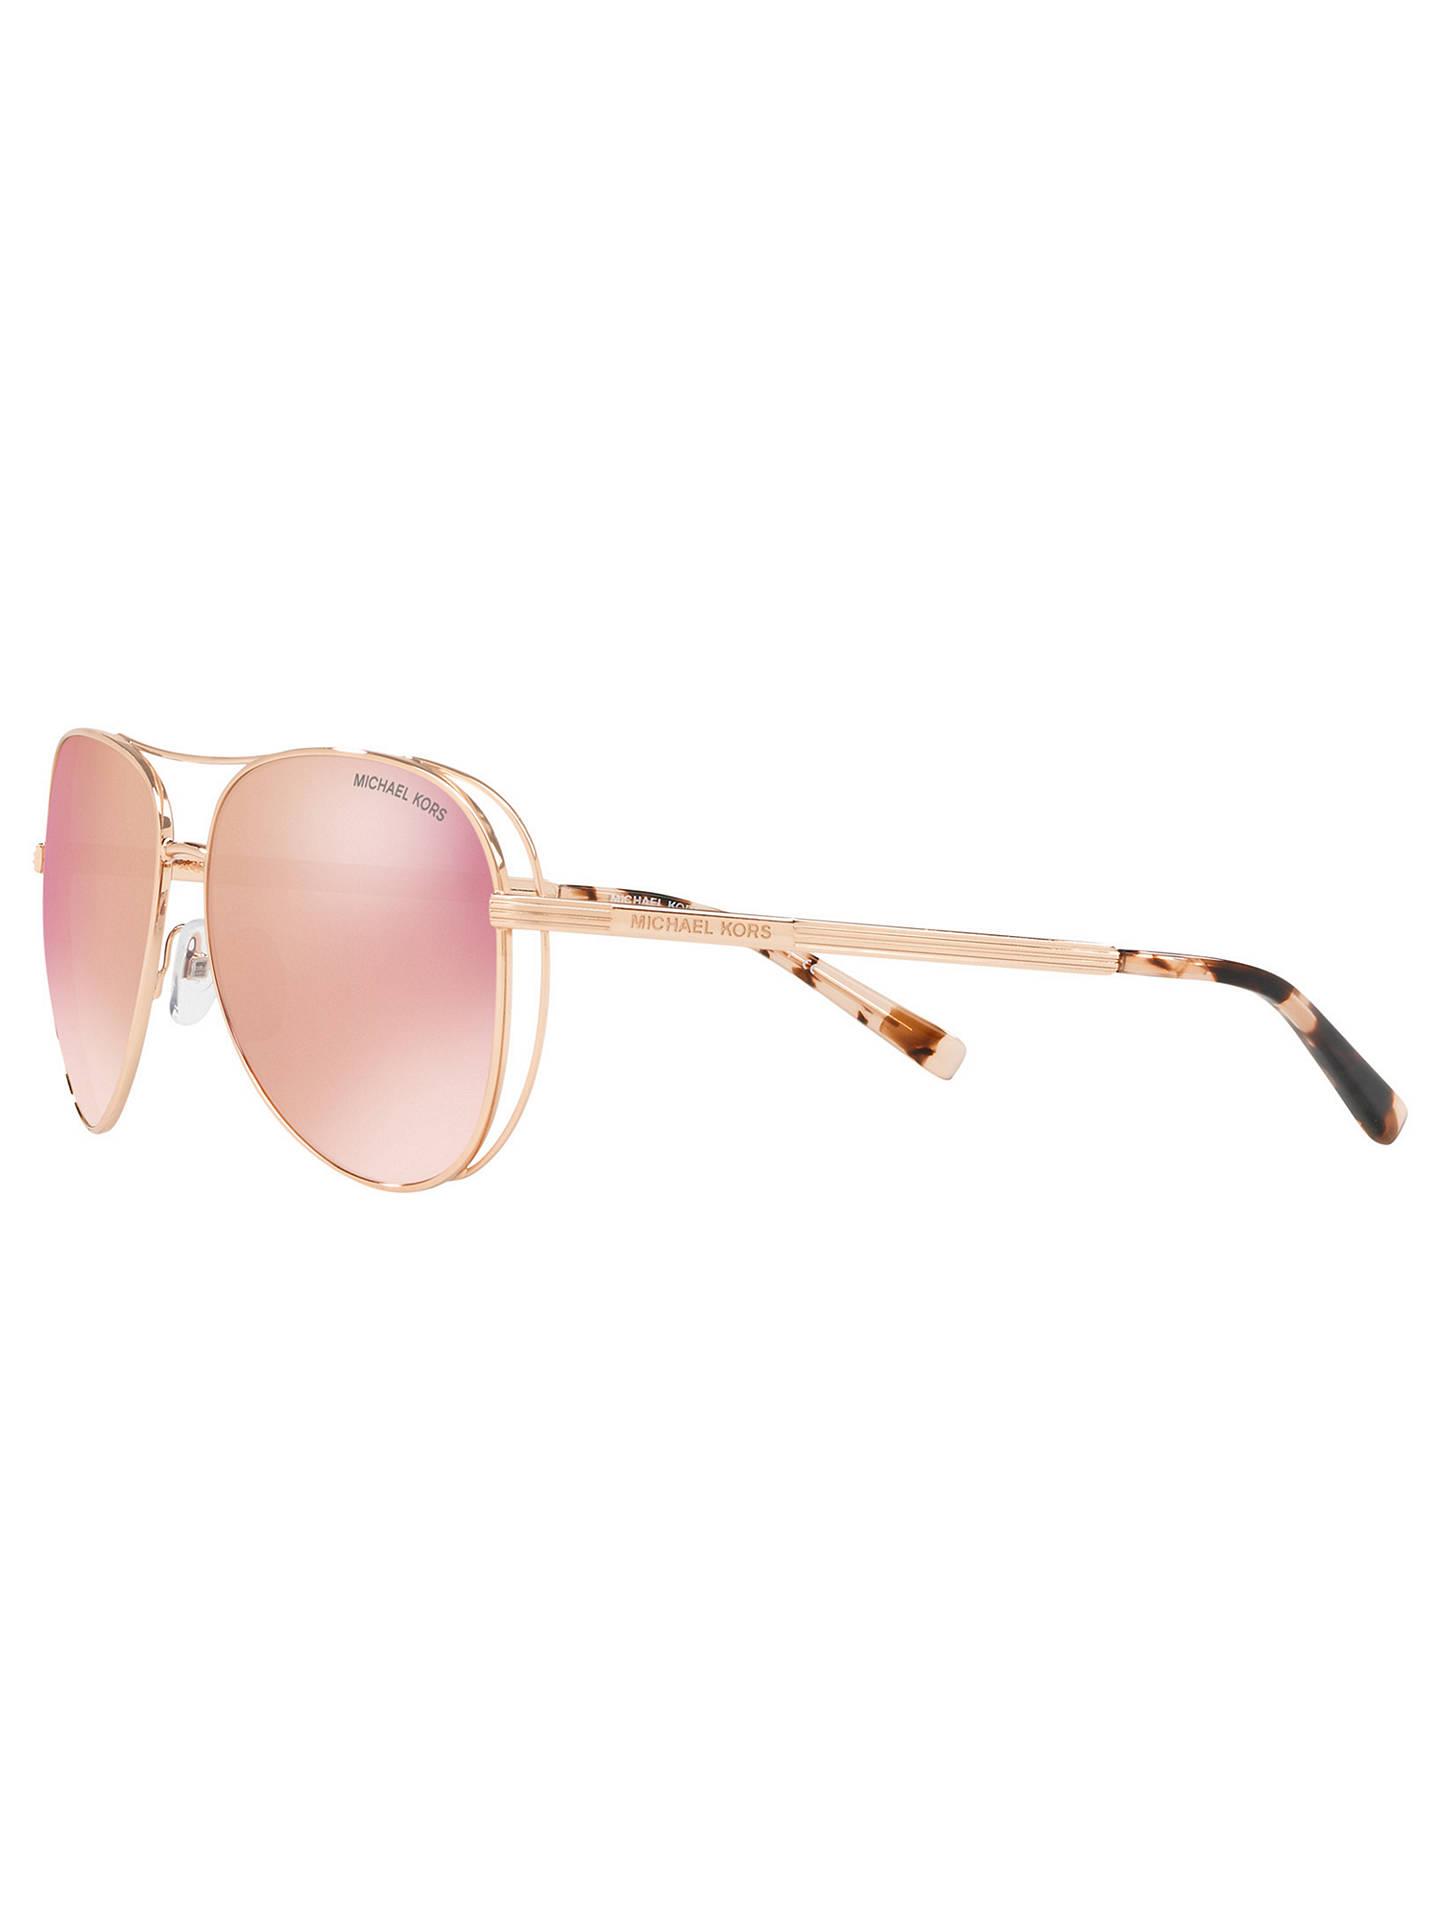 ab32c827f1 ... Buy Michael Kors MK1024 Women s Lai Polarised Aviator Sunglasses